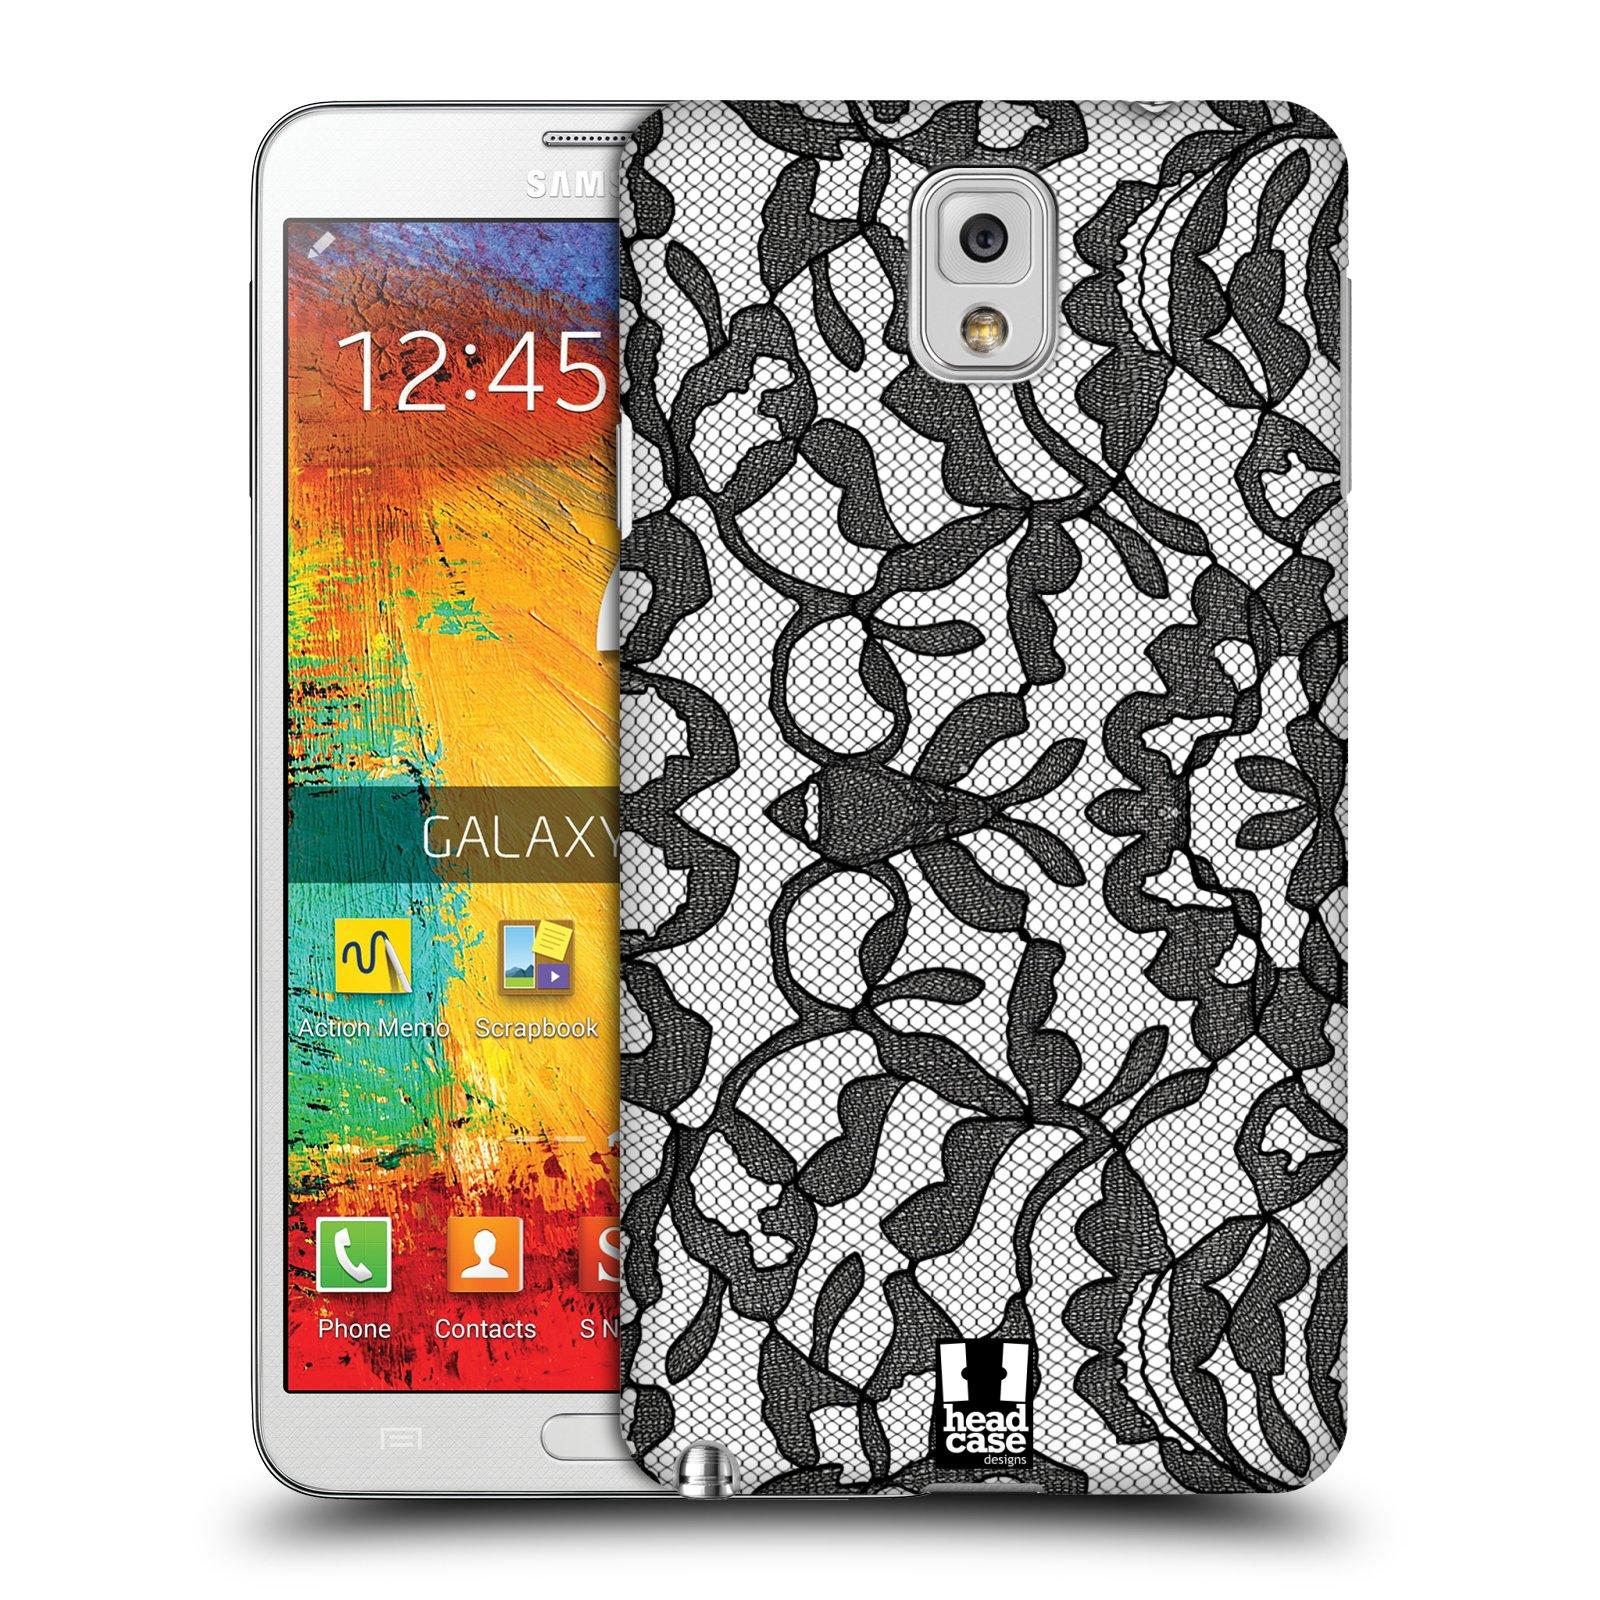 Plastové pouzdro na mobil Samsung Galaxy Note 3 HEAD CASE LEAFY KRAJKA (Kryt či obal na mobilní telefon Samsung Galaxy Note 3 SM-N9005)